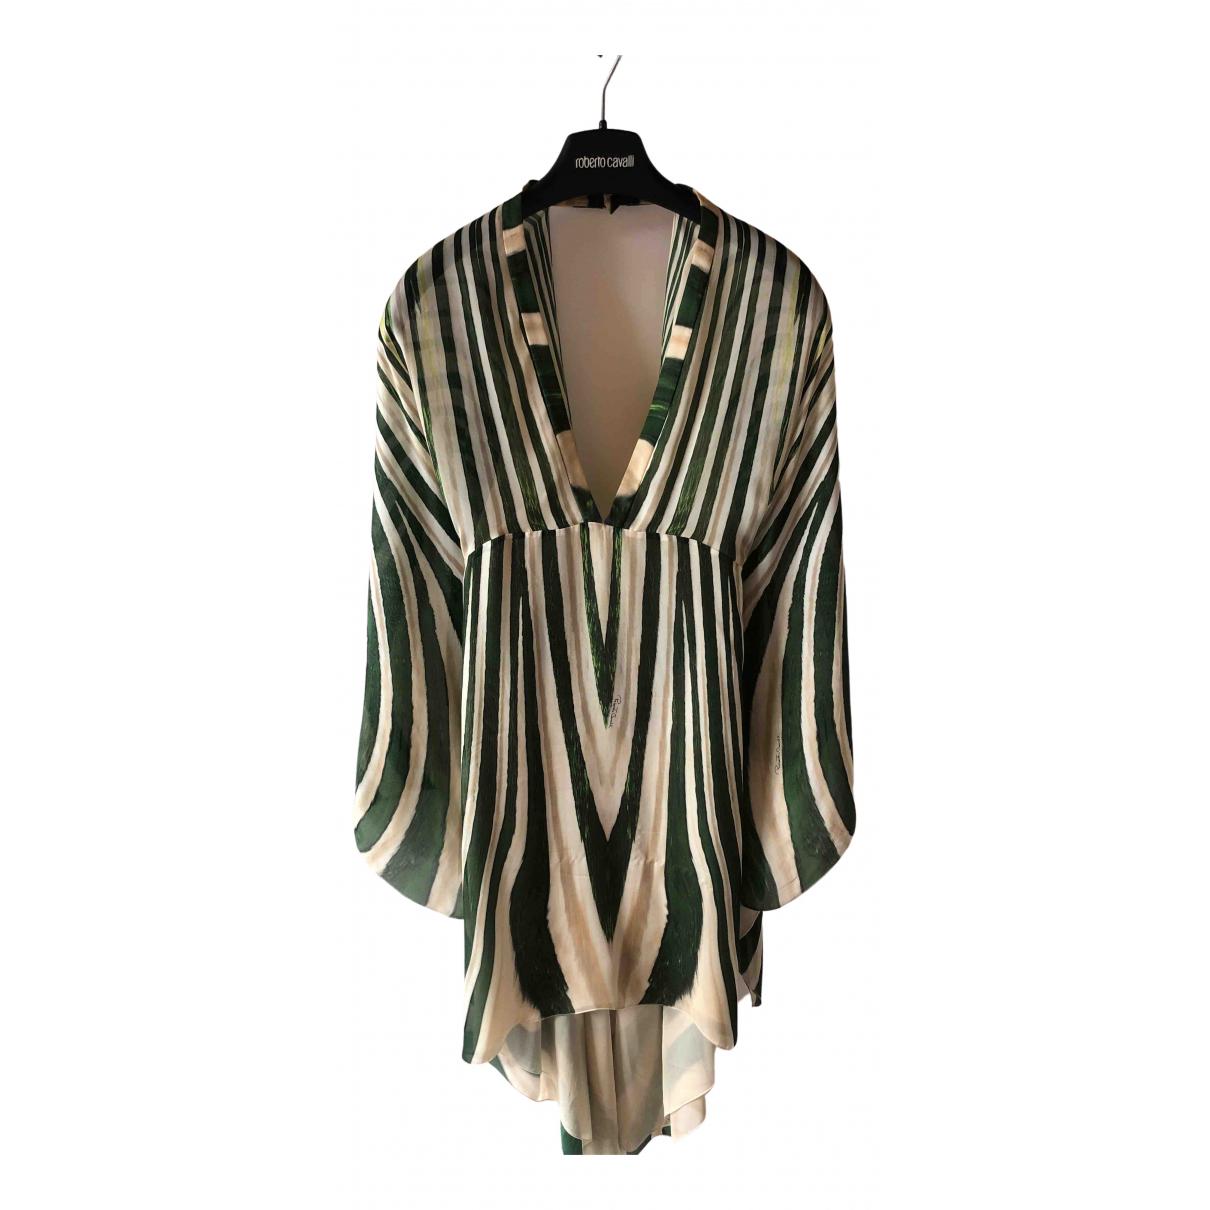 Roberto Cavalli \N Beige Silk dress for Women 44 IT